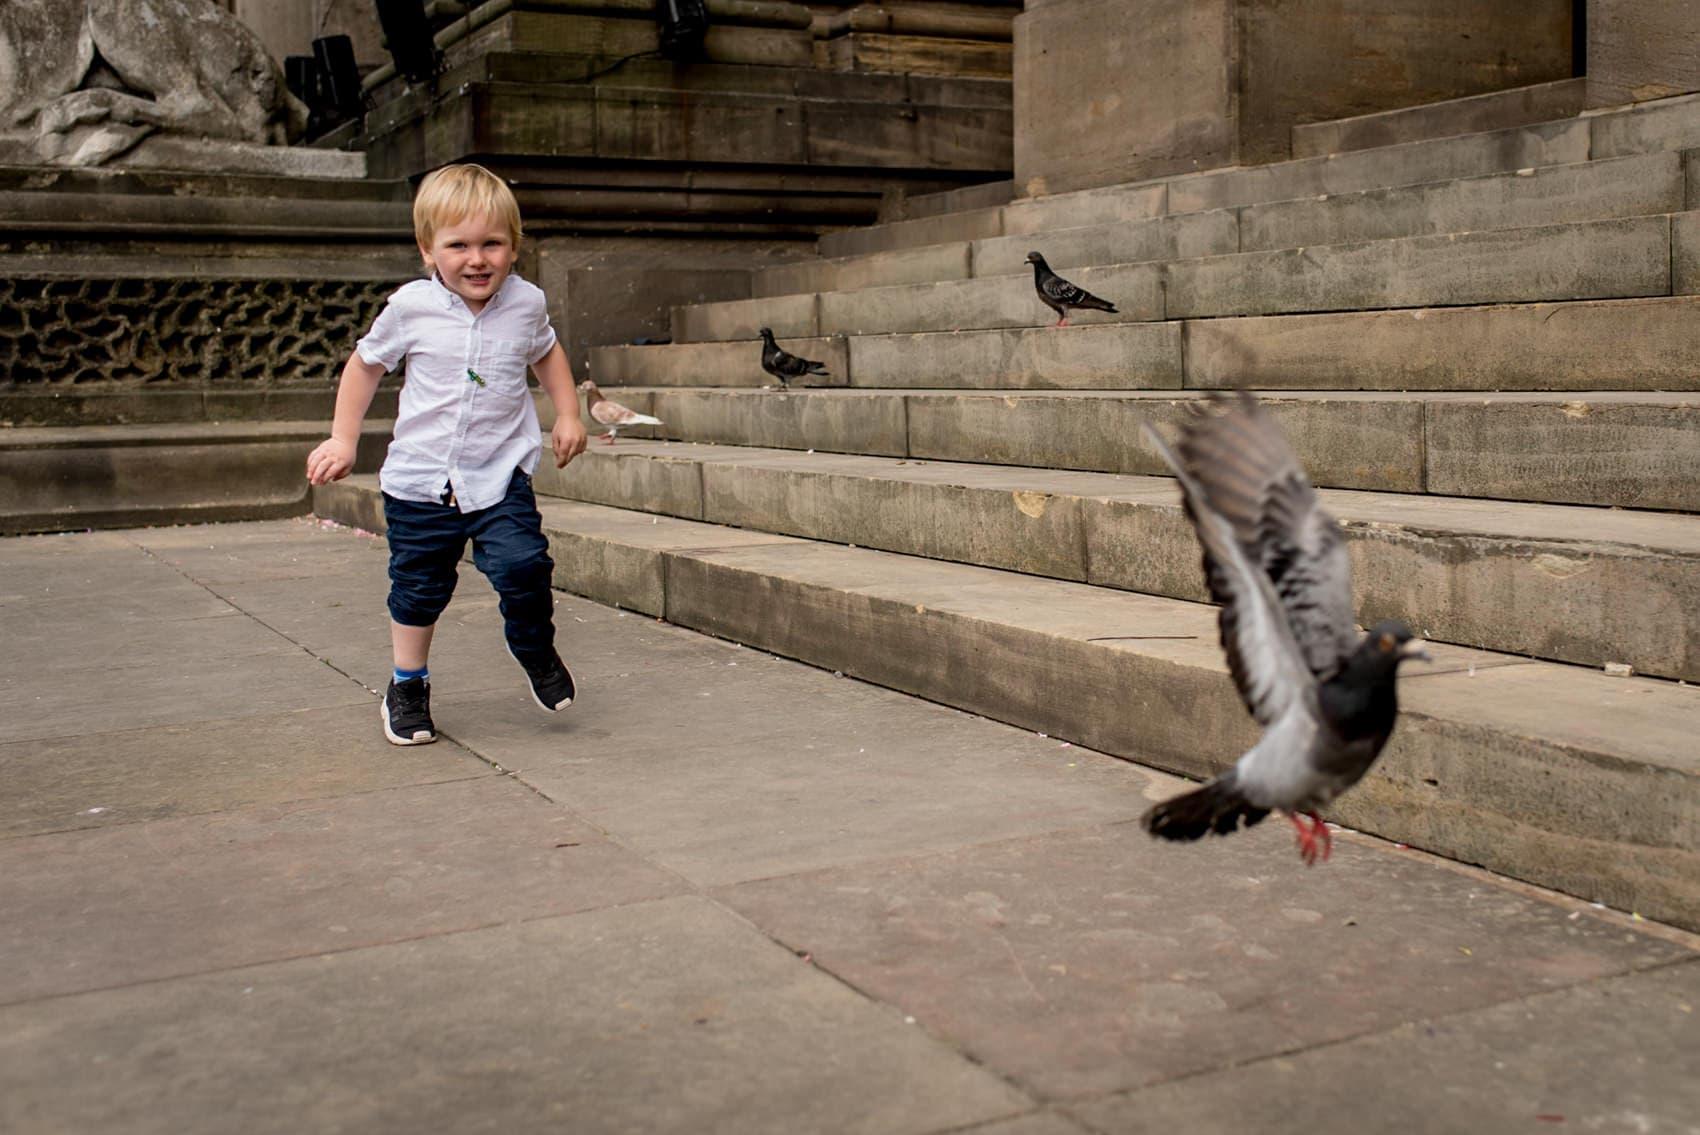 boy chasing pigeon